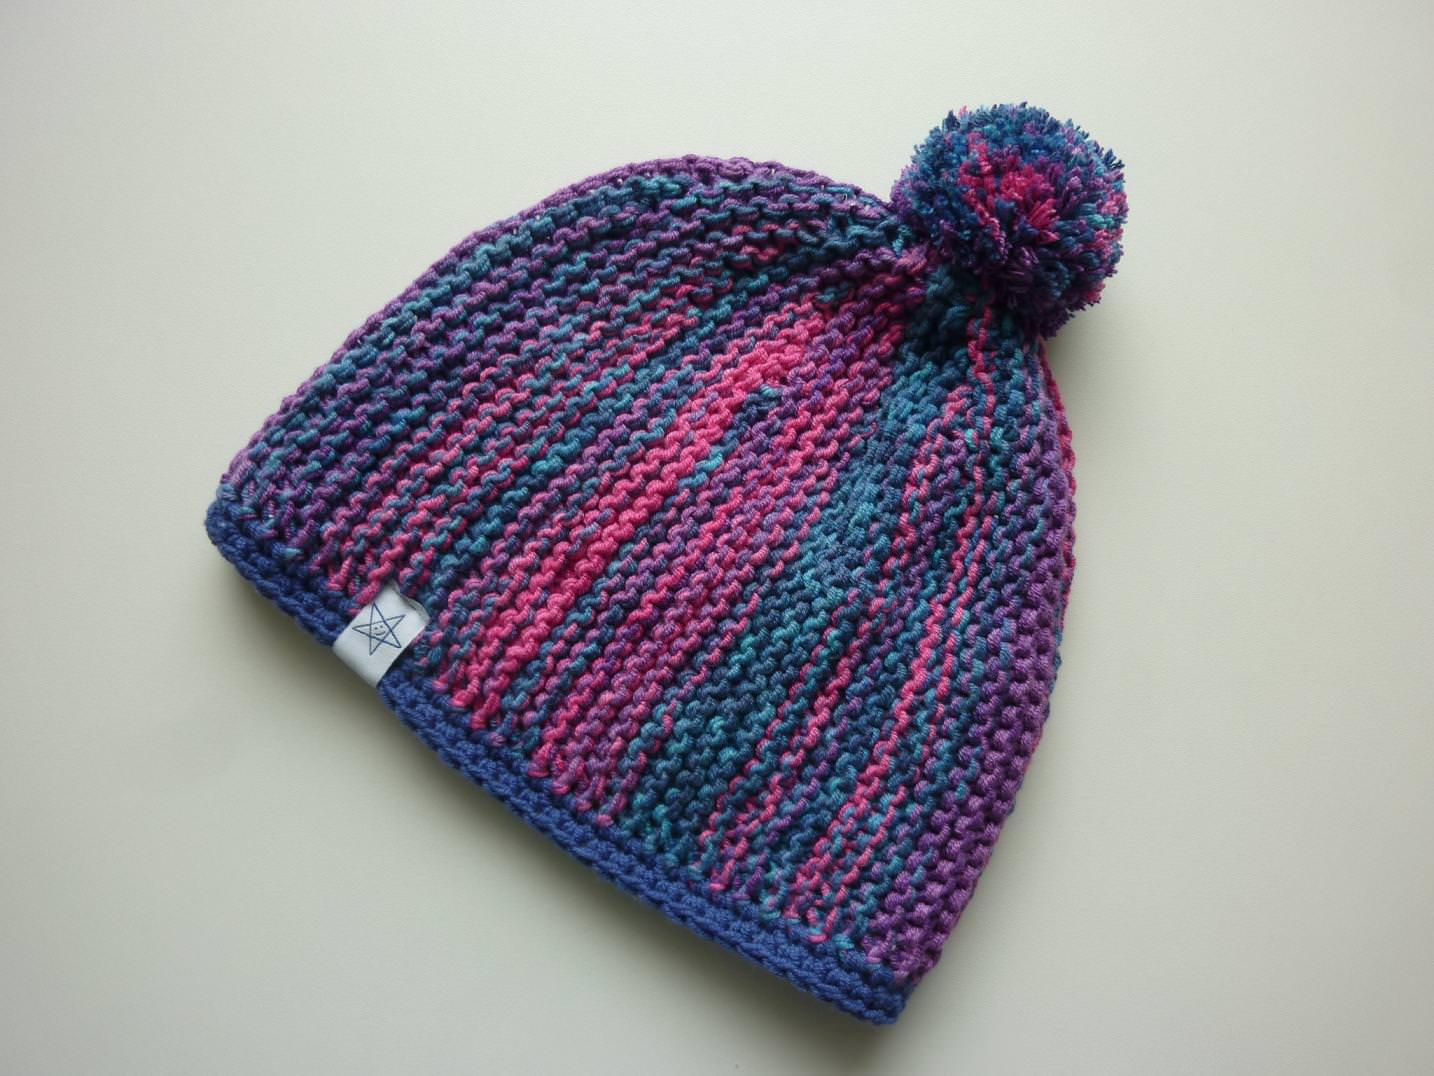 - Bommelmütze Pink Lila Blau aus Baumwolle handgestrickt, mit Fleece gefüttert - Bommelmütze Pink Lila Blau aus Baumwolle handgestrickt, mit Fleece gefüttert